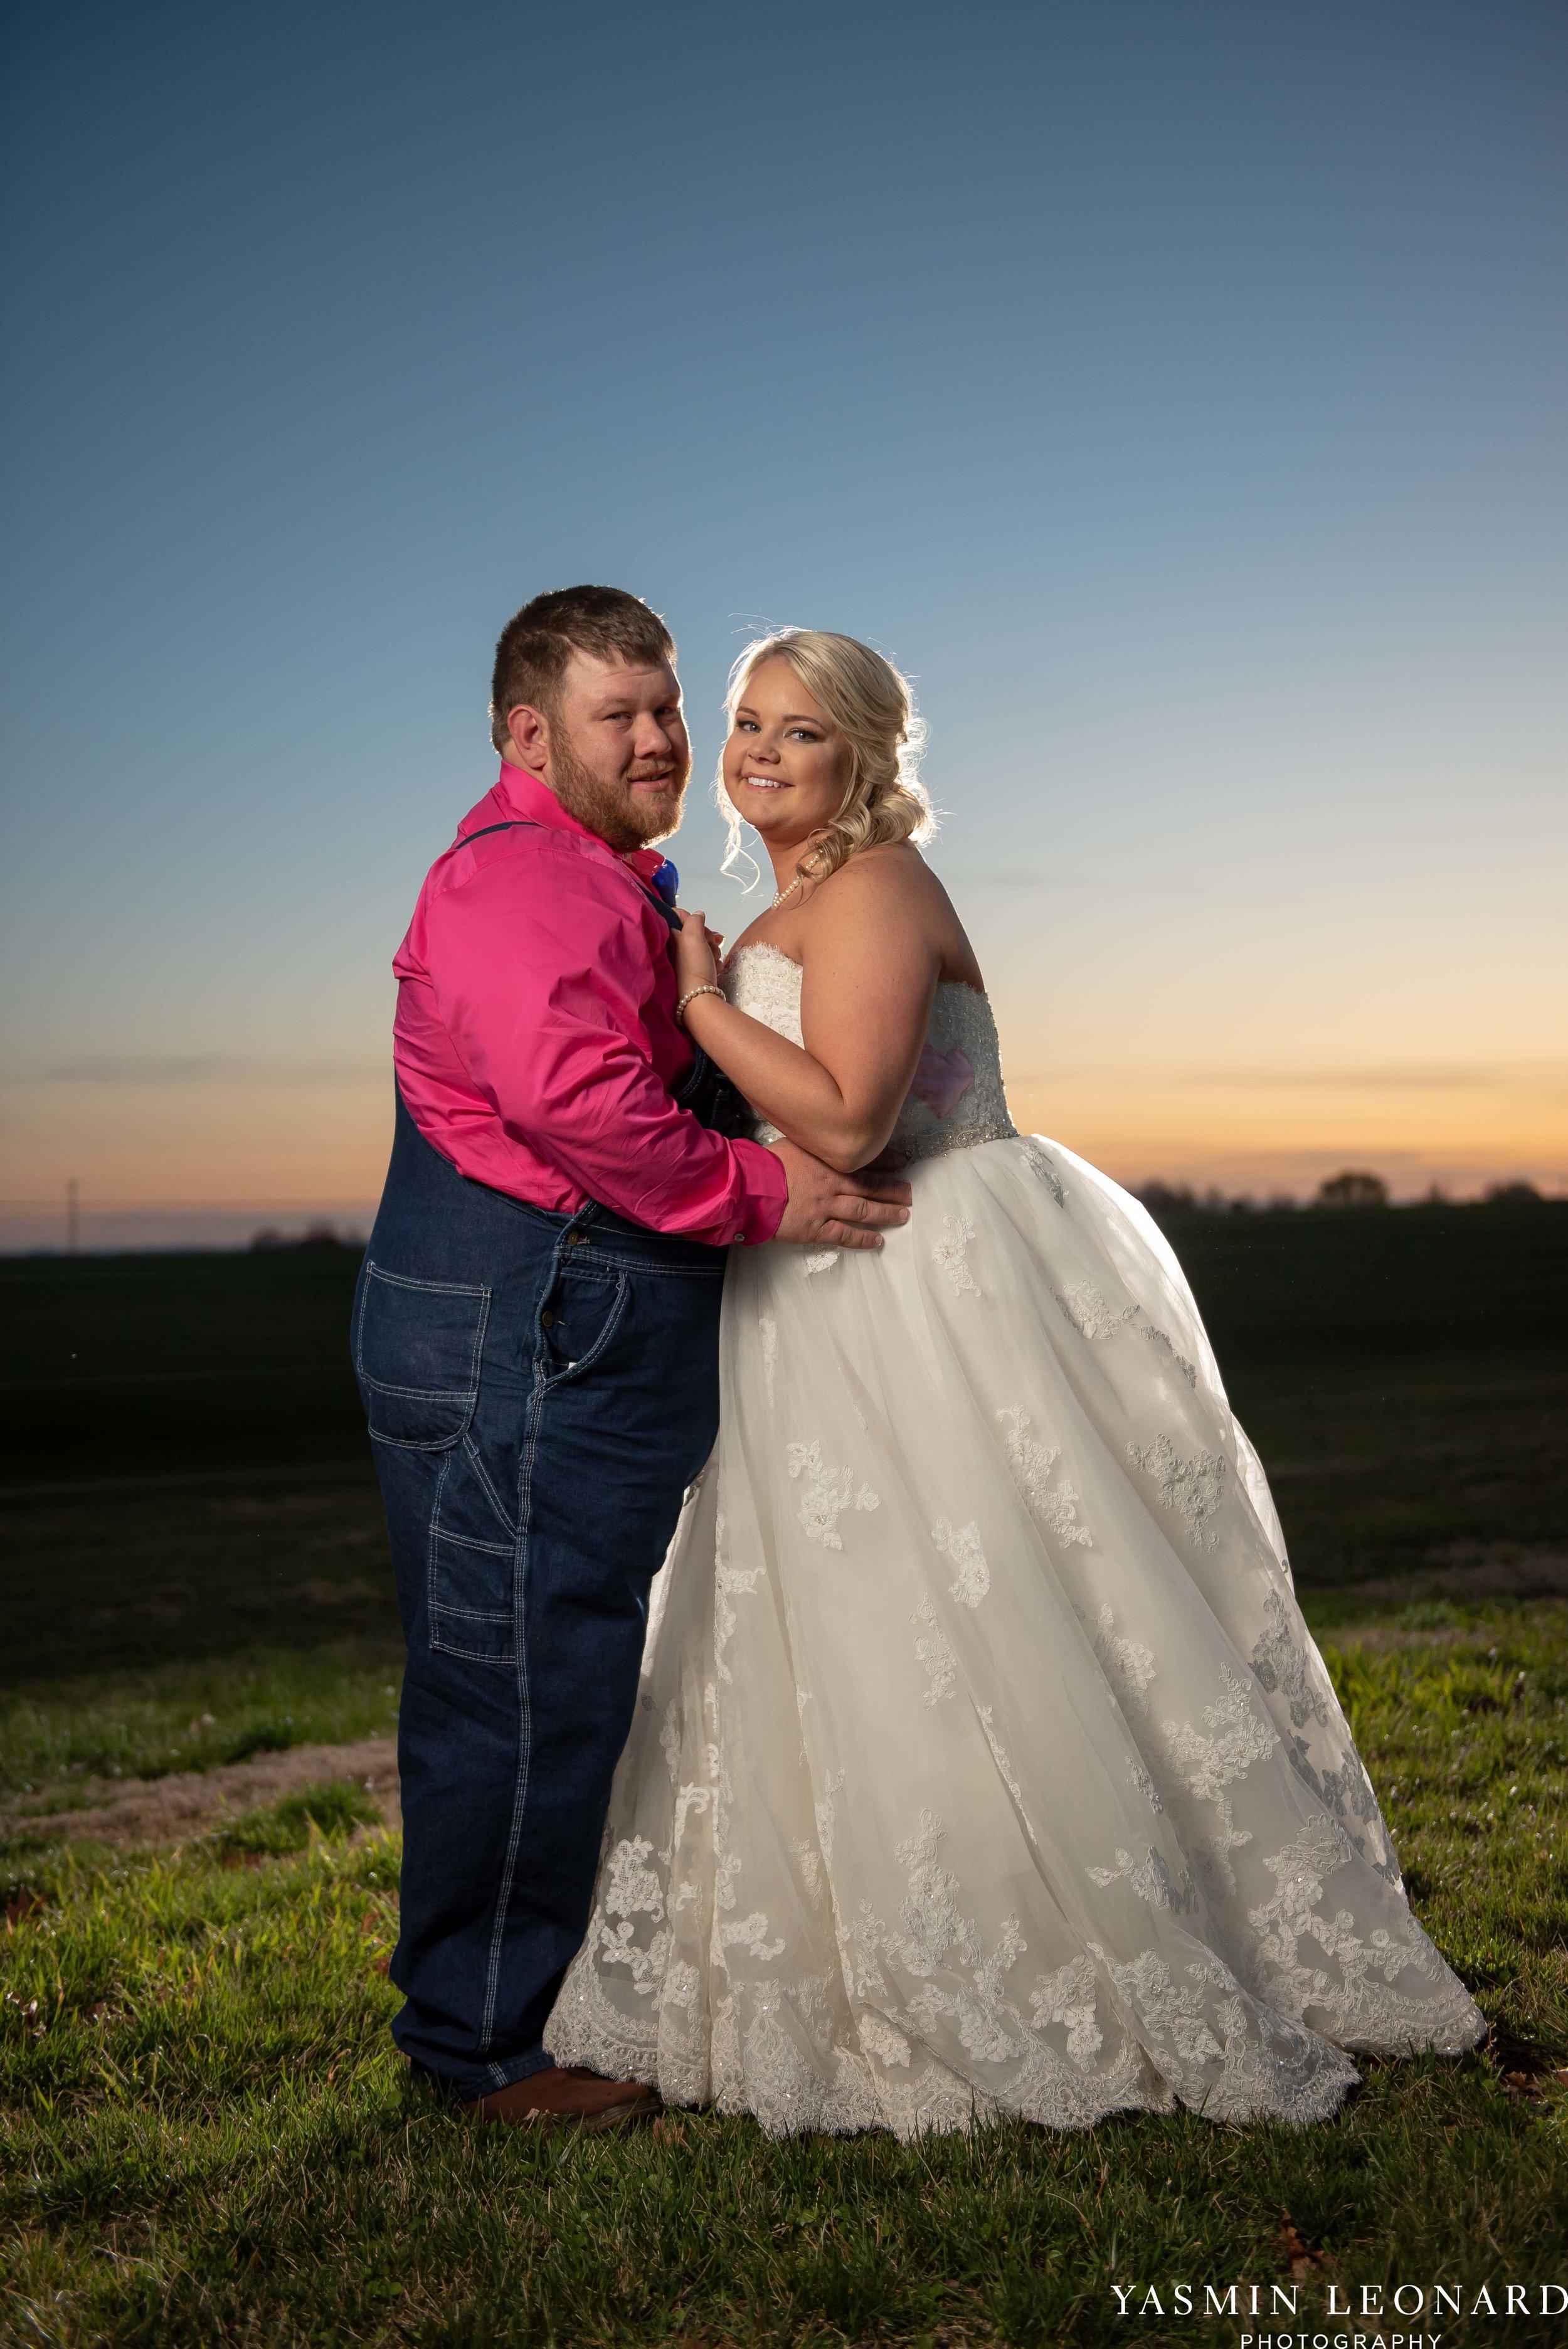 The Barn at Heritage Farm - Country Wedding - Pink and Blue Wedding - Barn Wedding - Outdoor Wedding - Cotton and Wheat Decor - Groom in Bibs - Pink Bridal Colors - Yasmin Leonard Photography-30.jpg